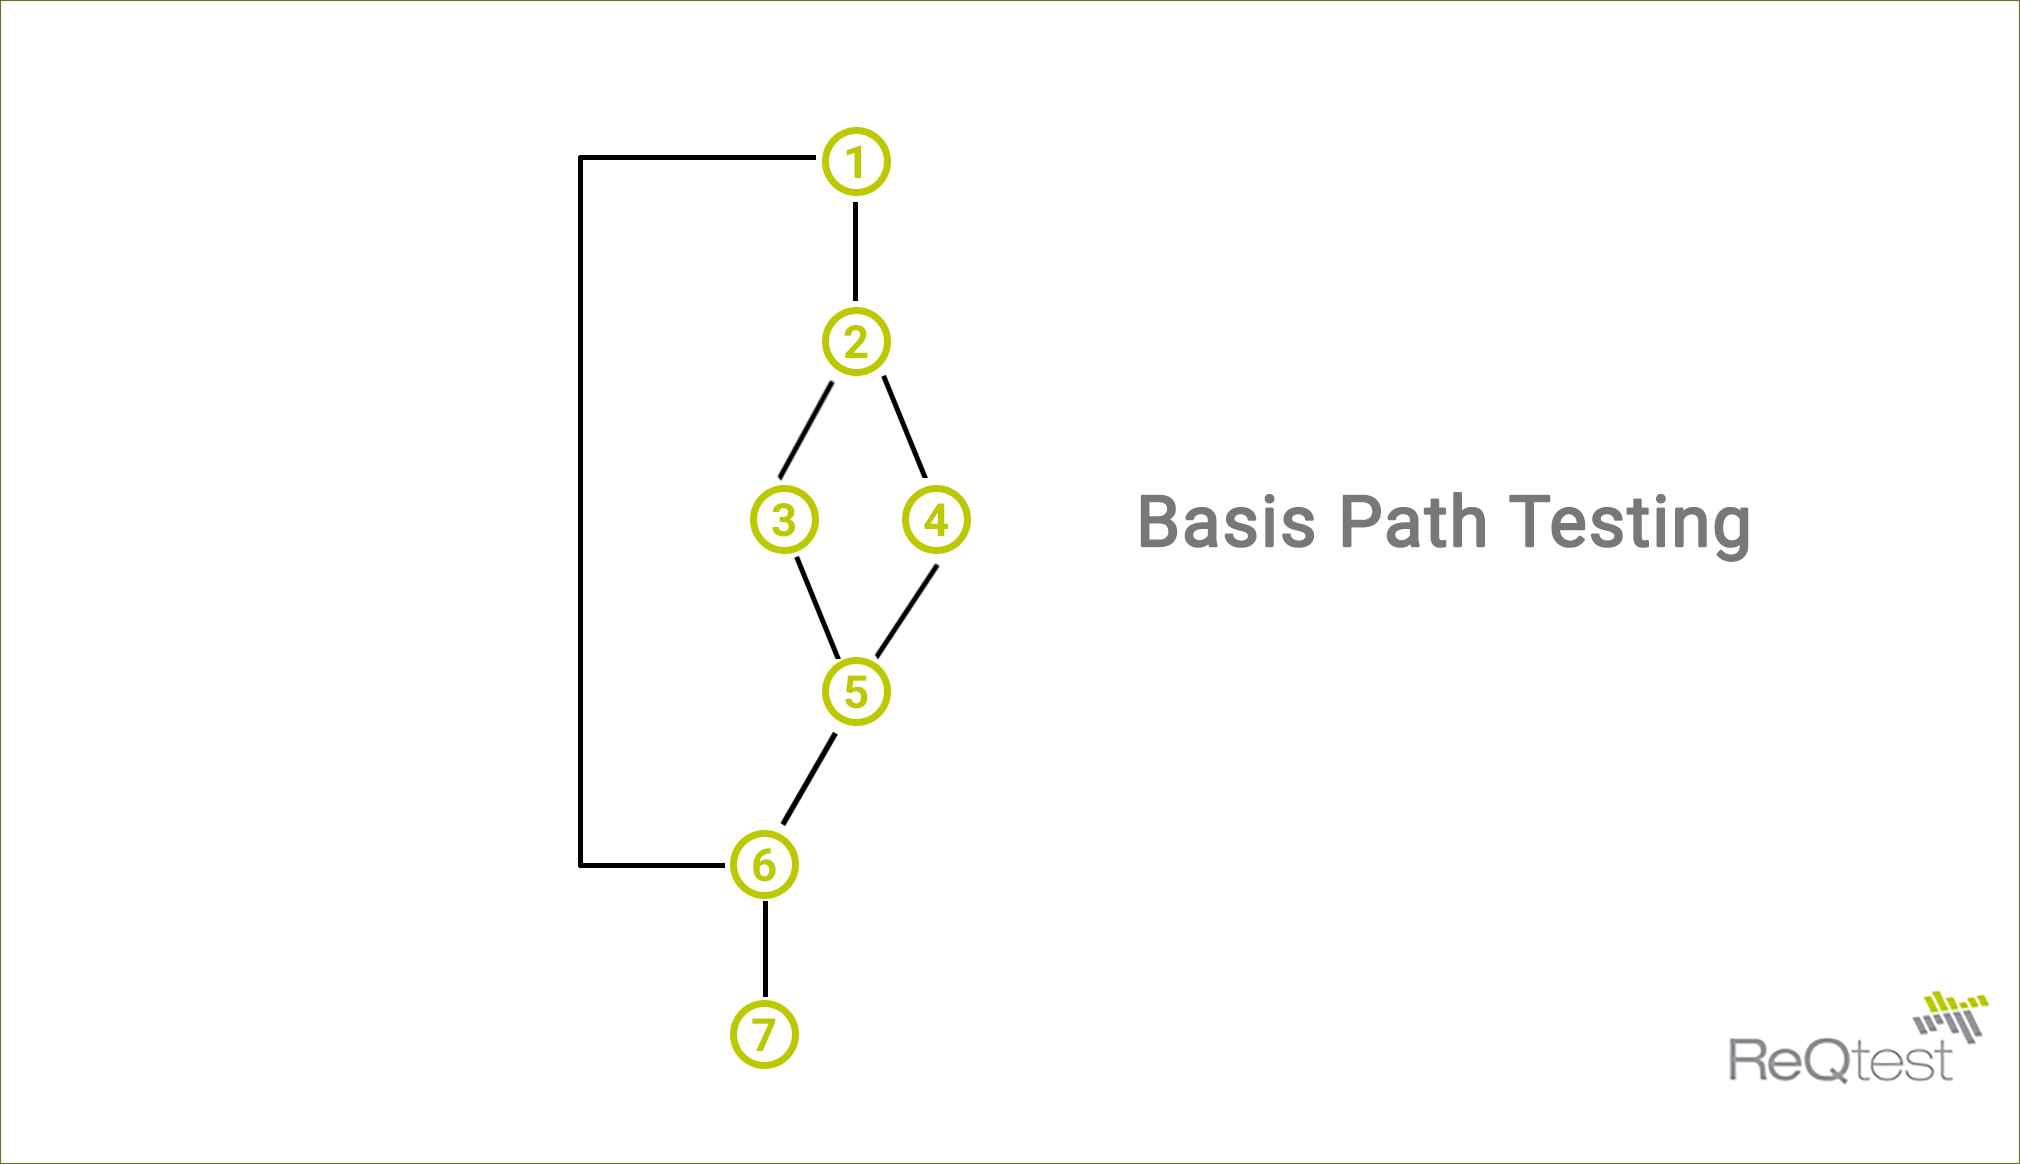 steps of basis path testing